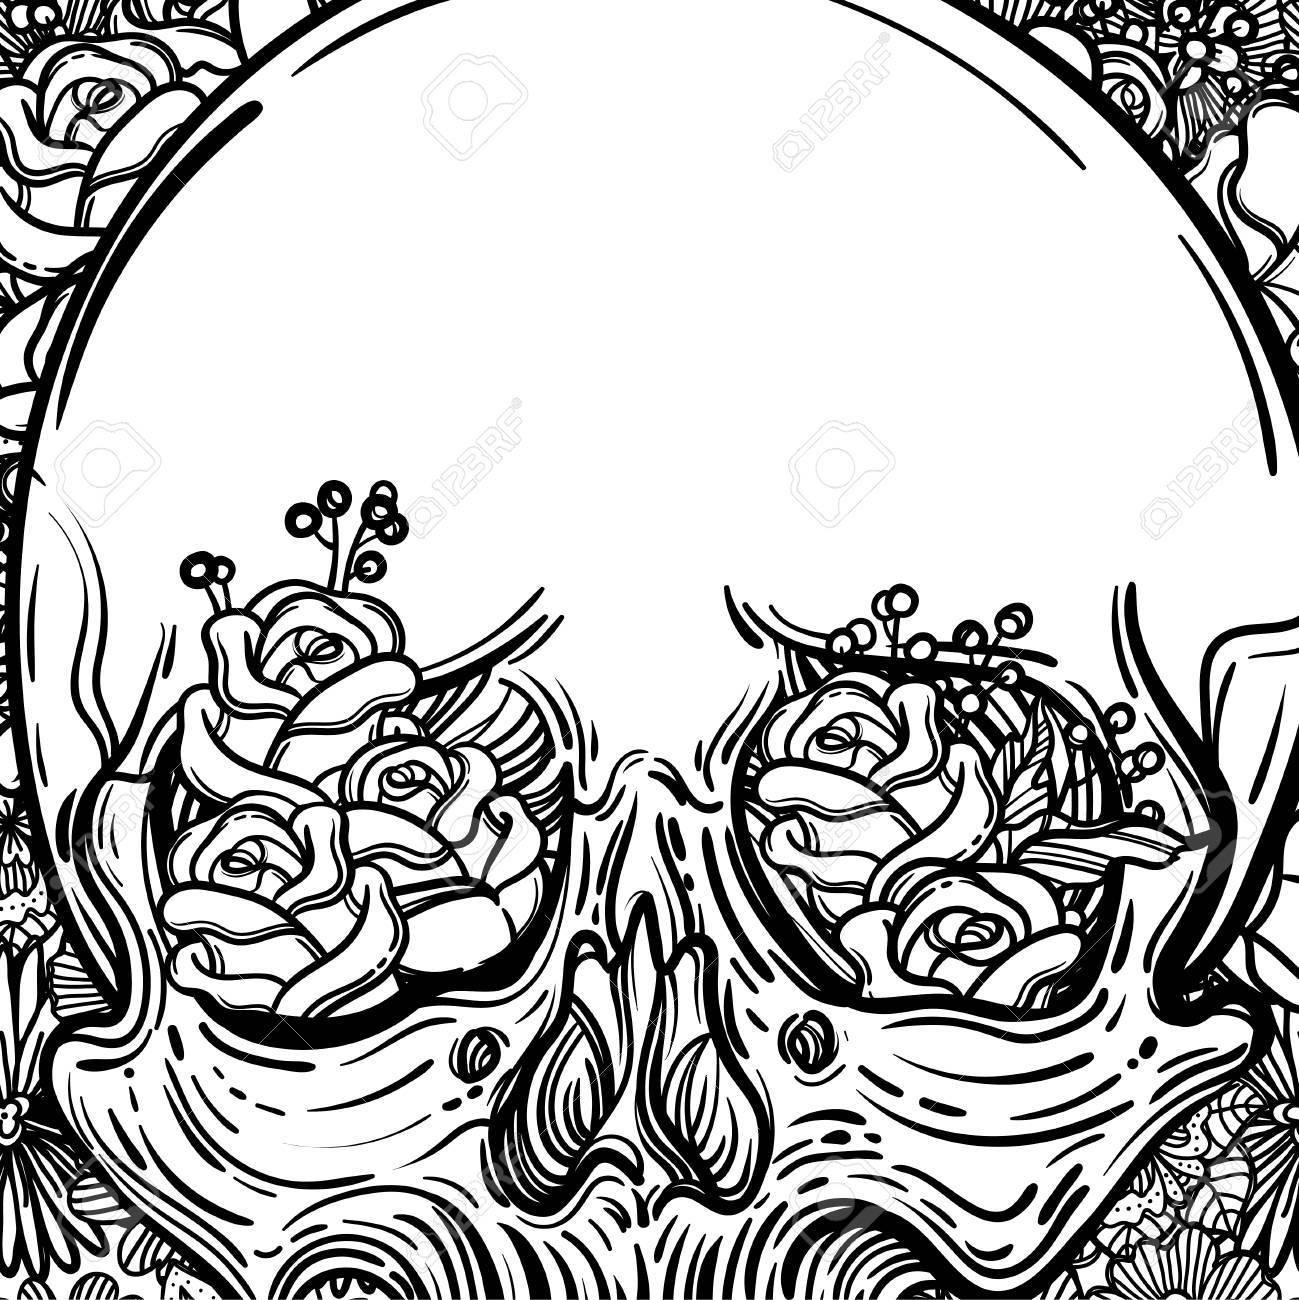 1299x1300 Line Art Illustration. Scary Skull And Flowers. Vintage Print